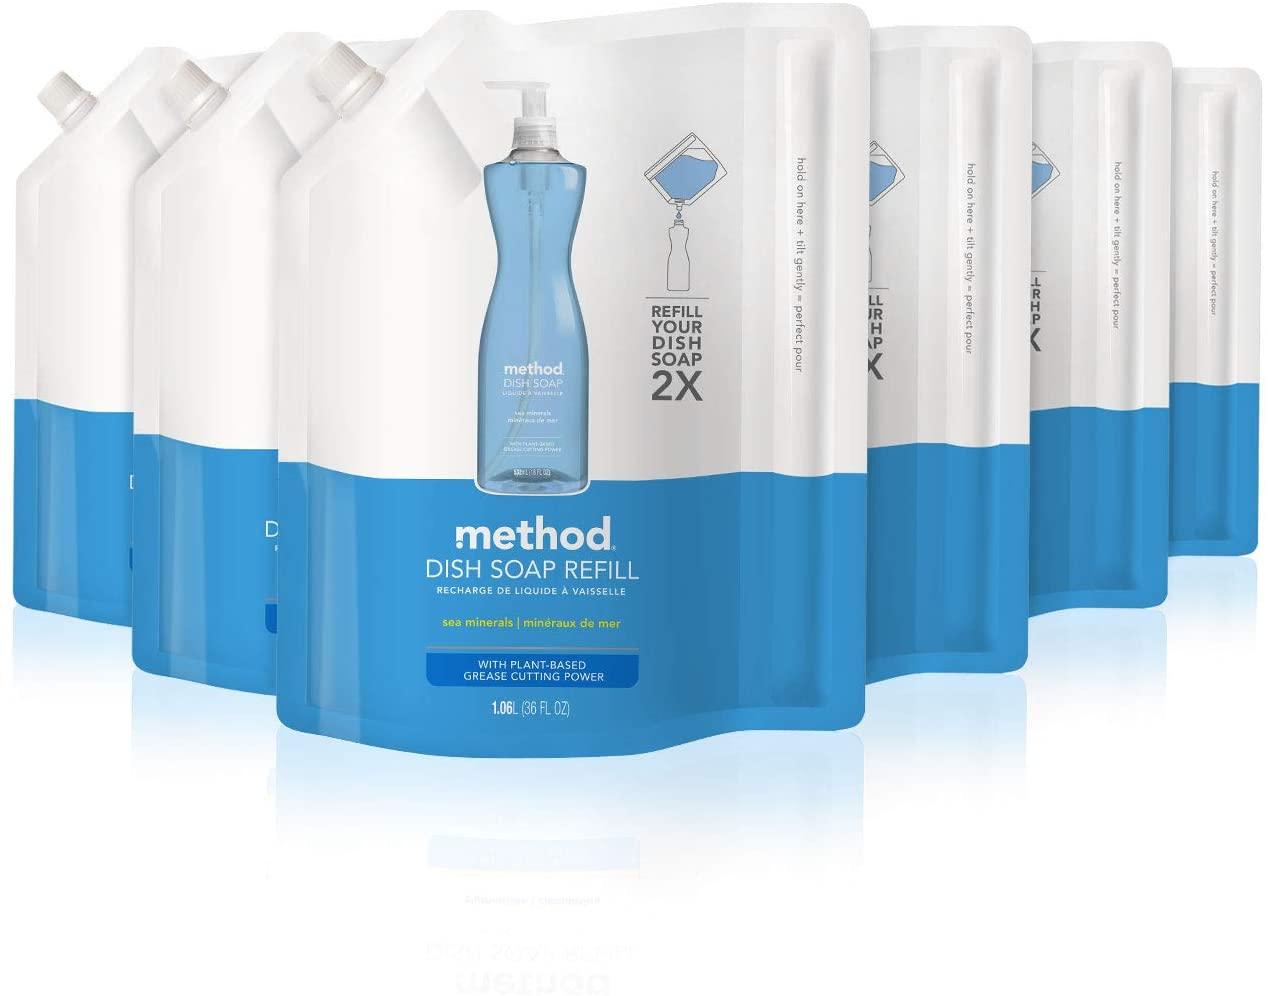 Method Dish Soap Refill, Sea Minerals, 36 Fl. Oz (Pack of 6)